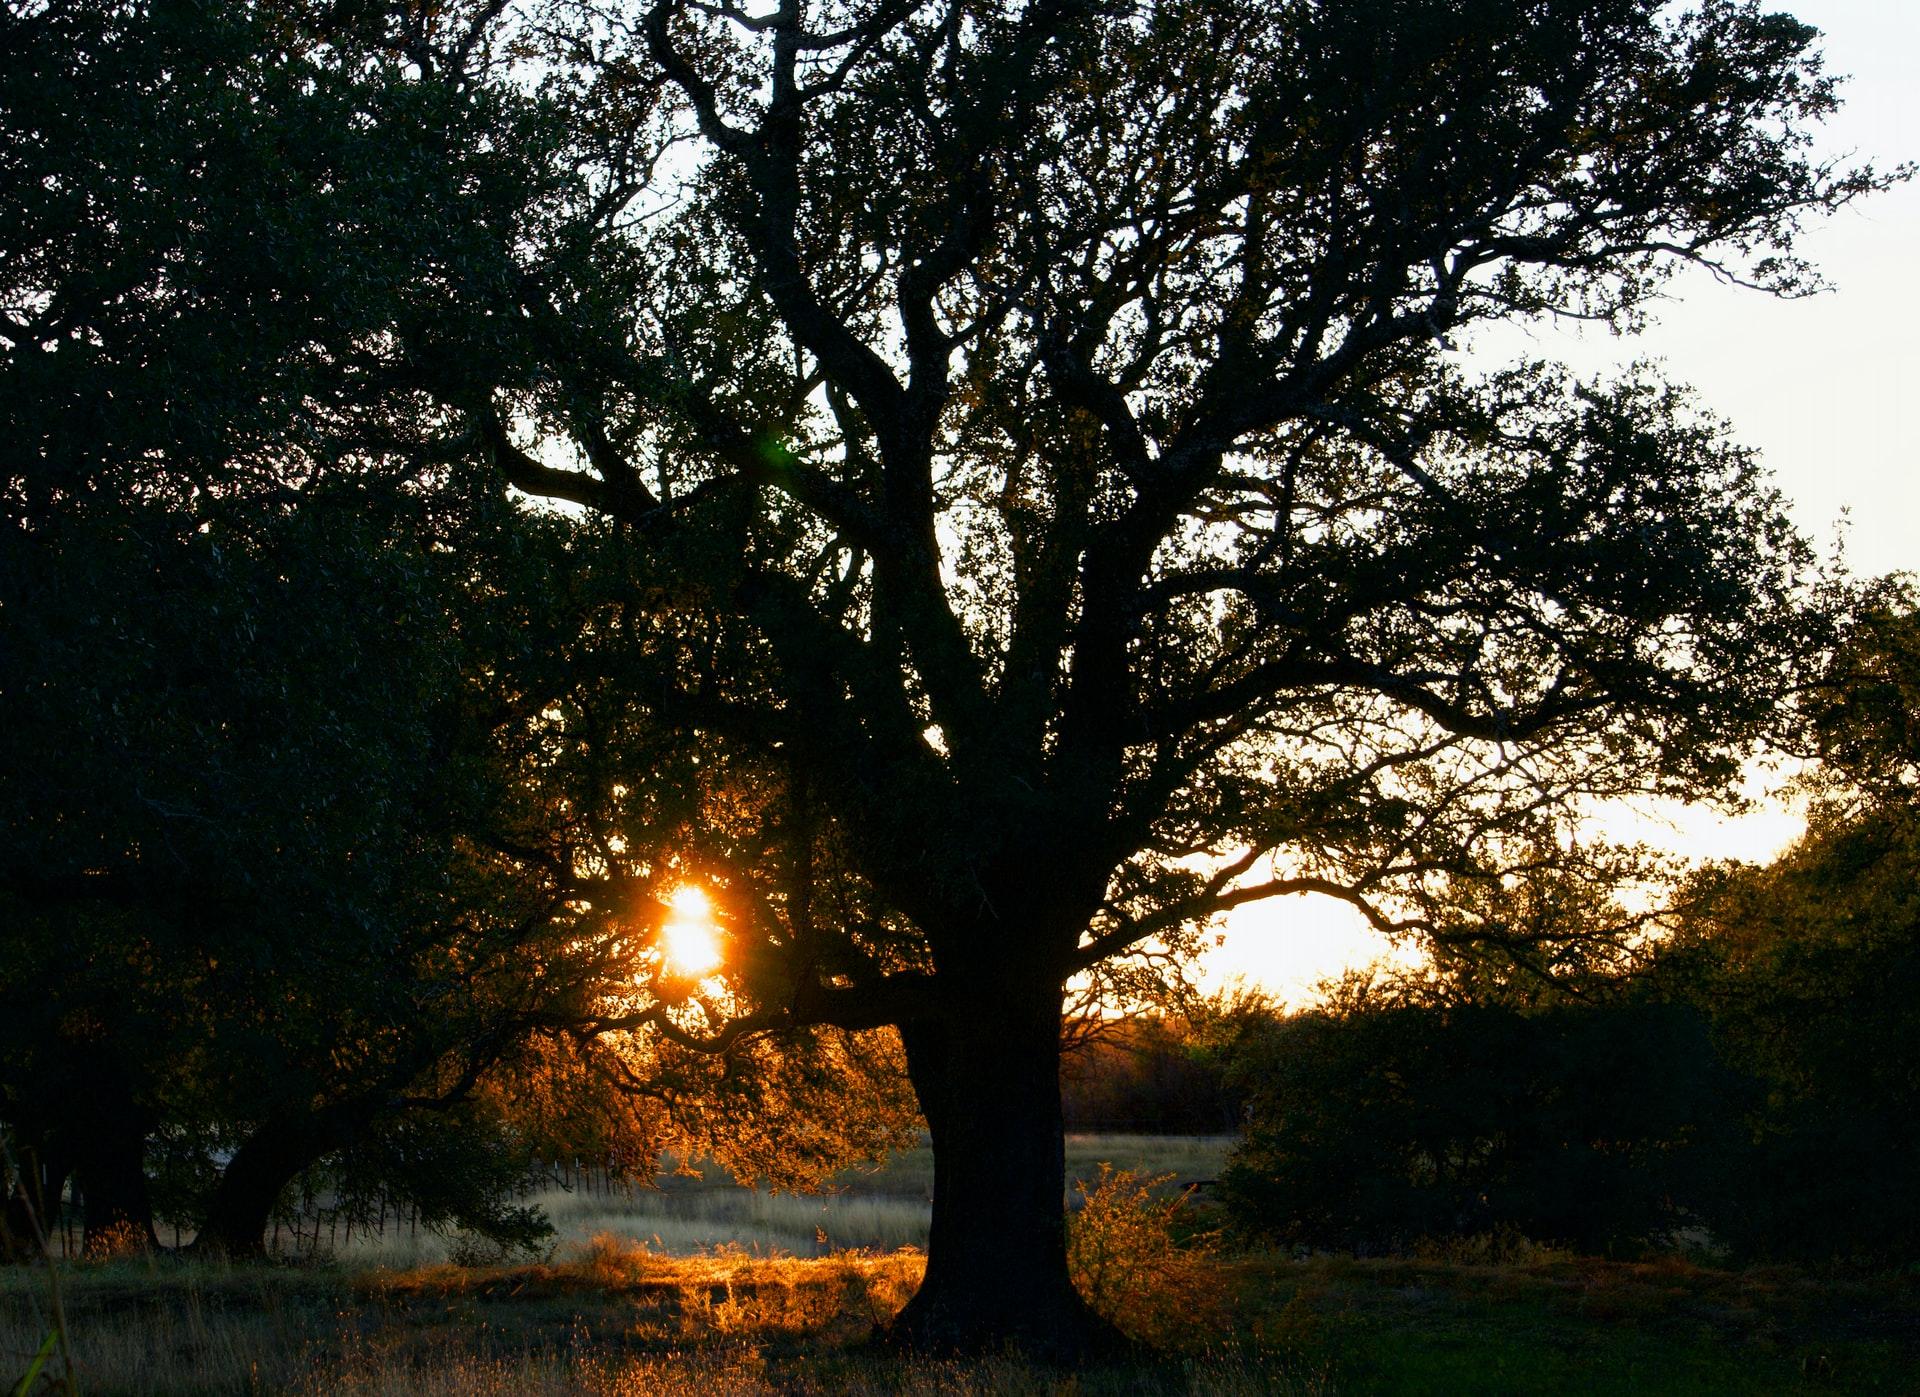 Native Texas hardwood tree often used for flooring